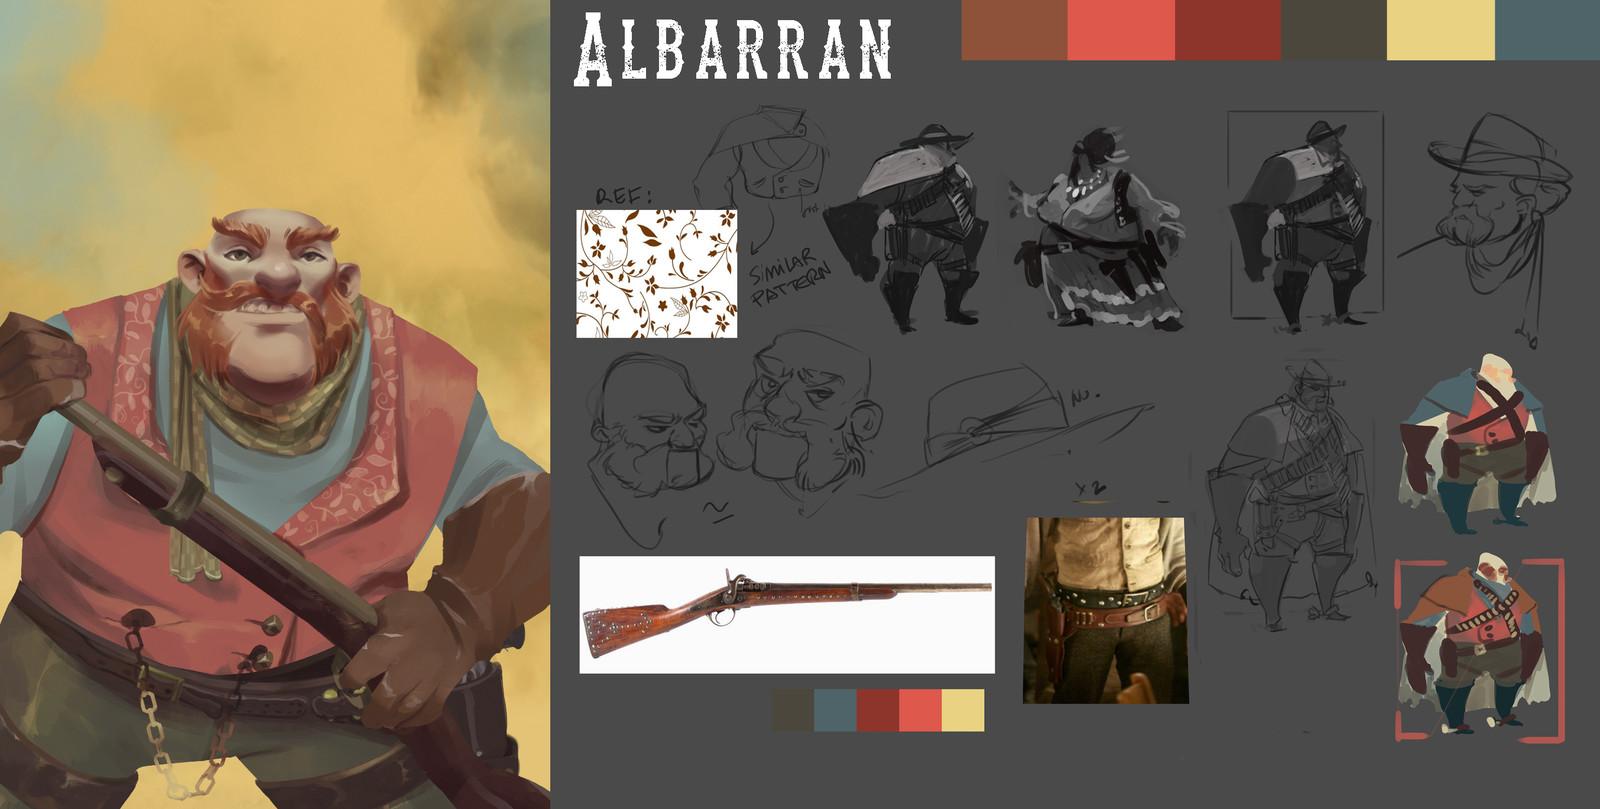 Part of the process followed to design Albarrán.